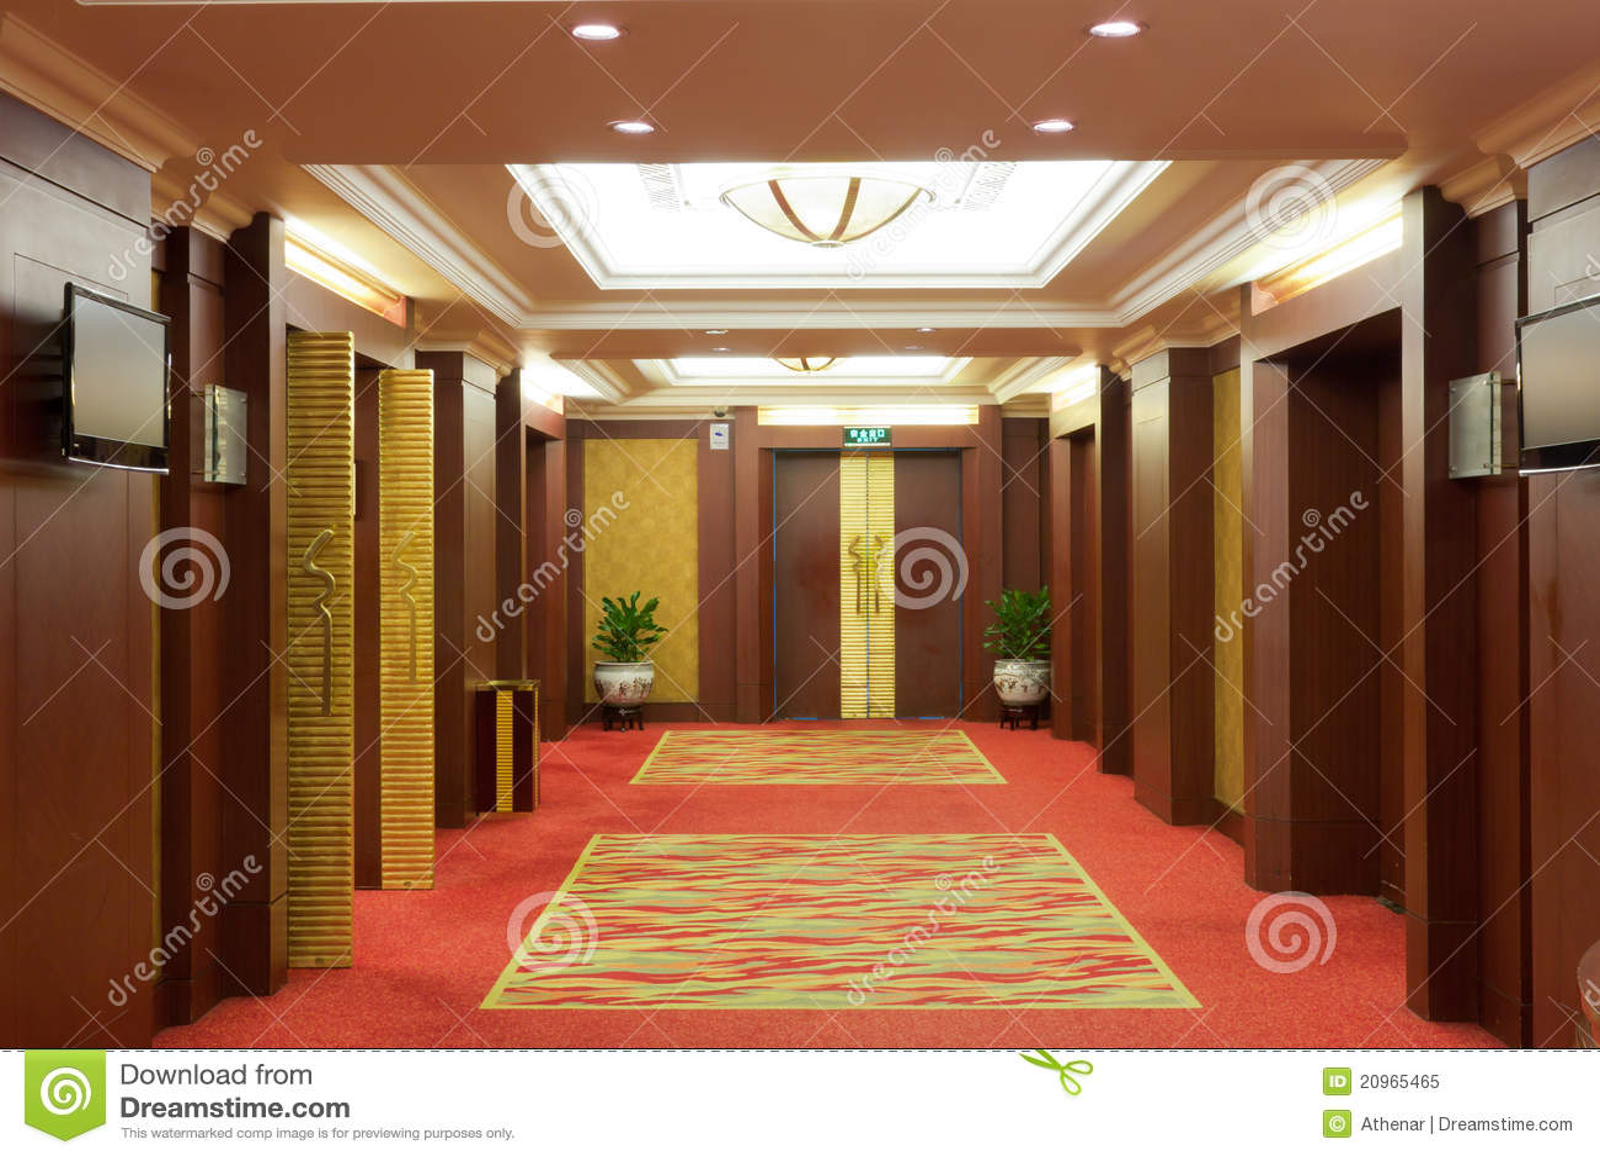 Luxury Hotel Corridor Interior Stock Image Image 20965465